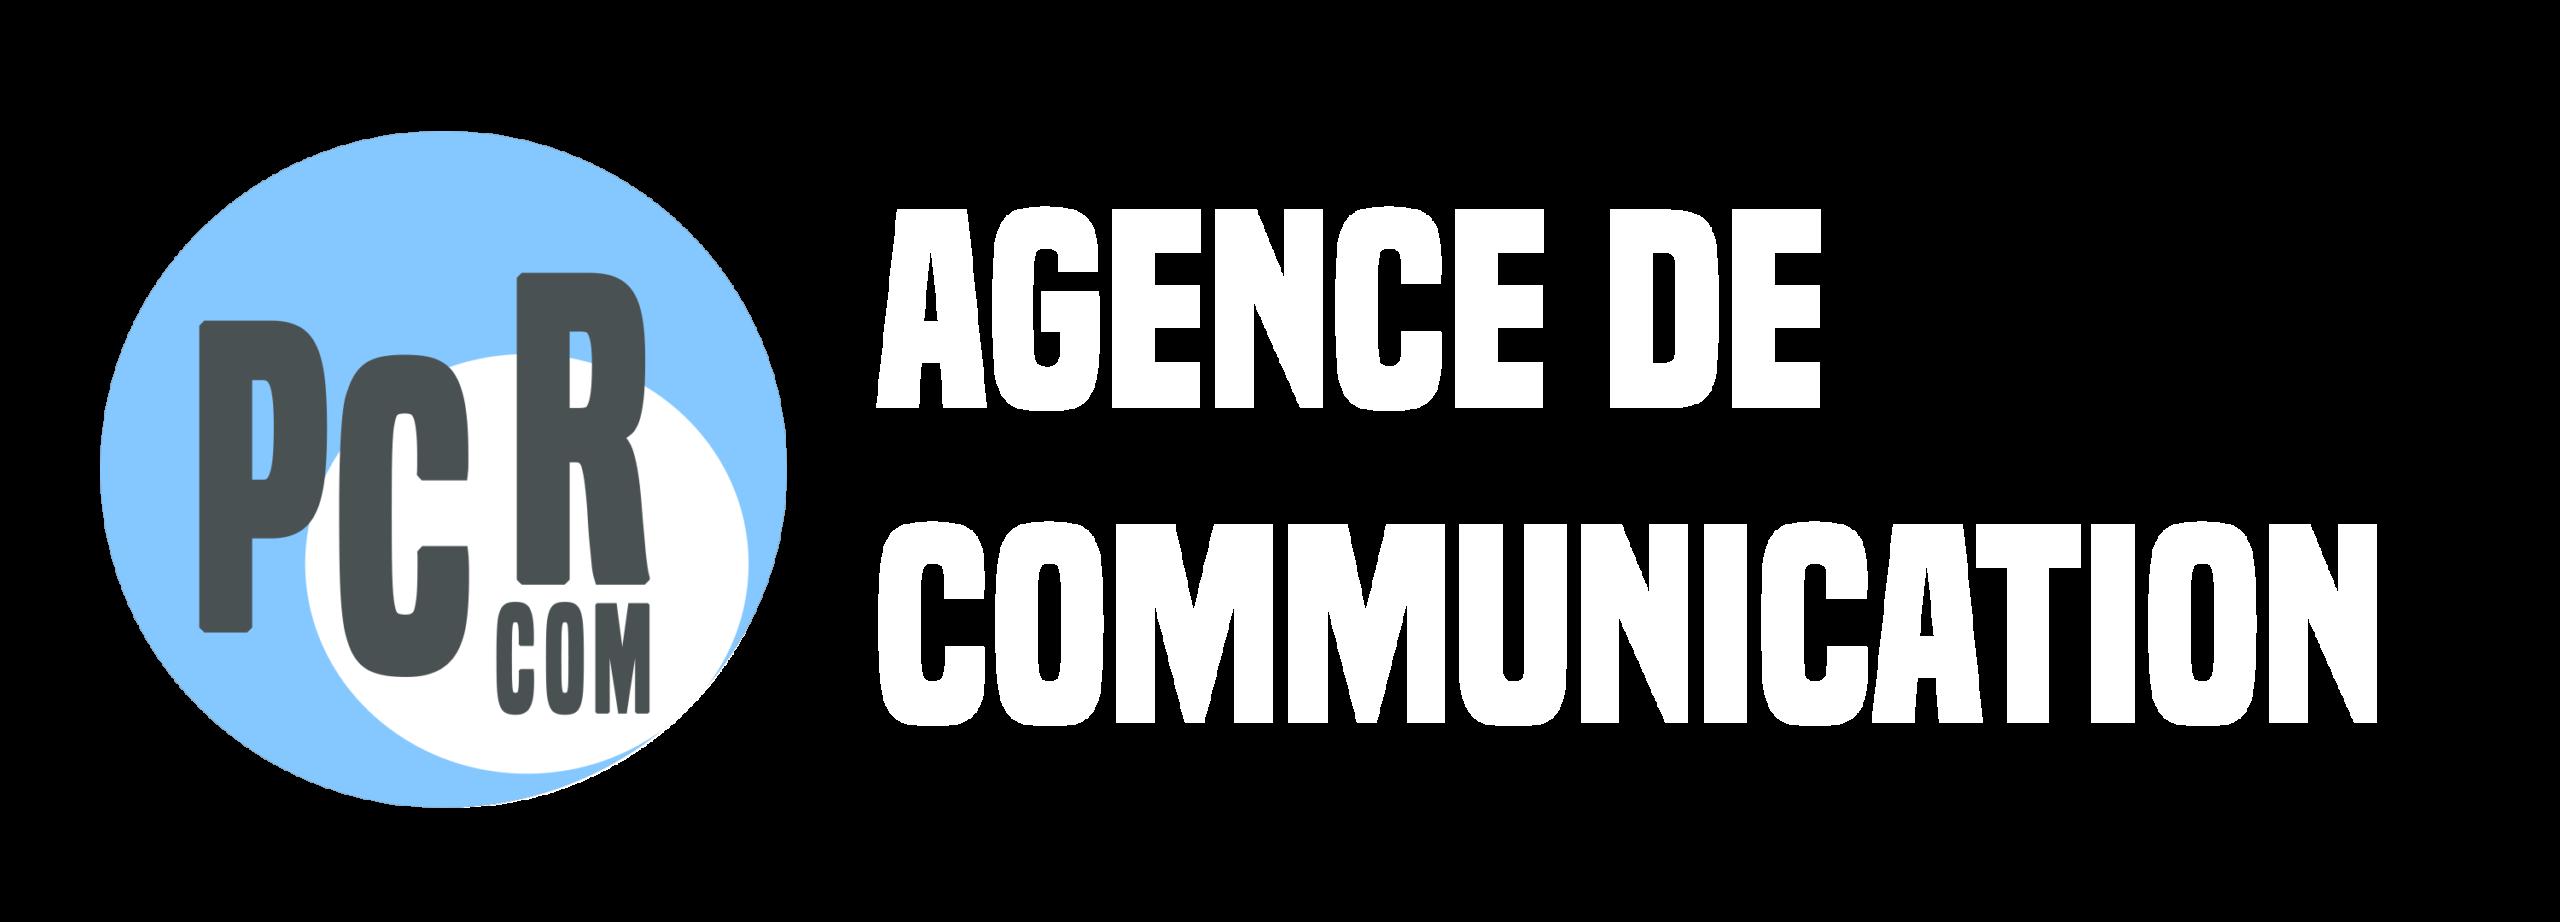 logo pcr-communication